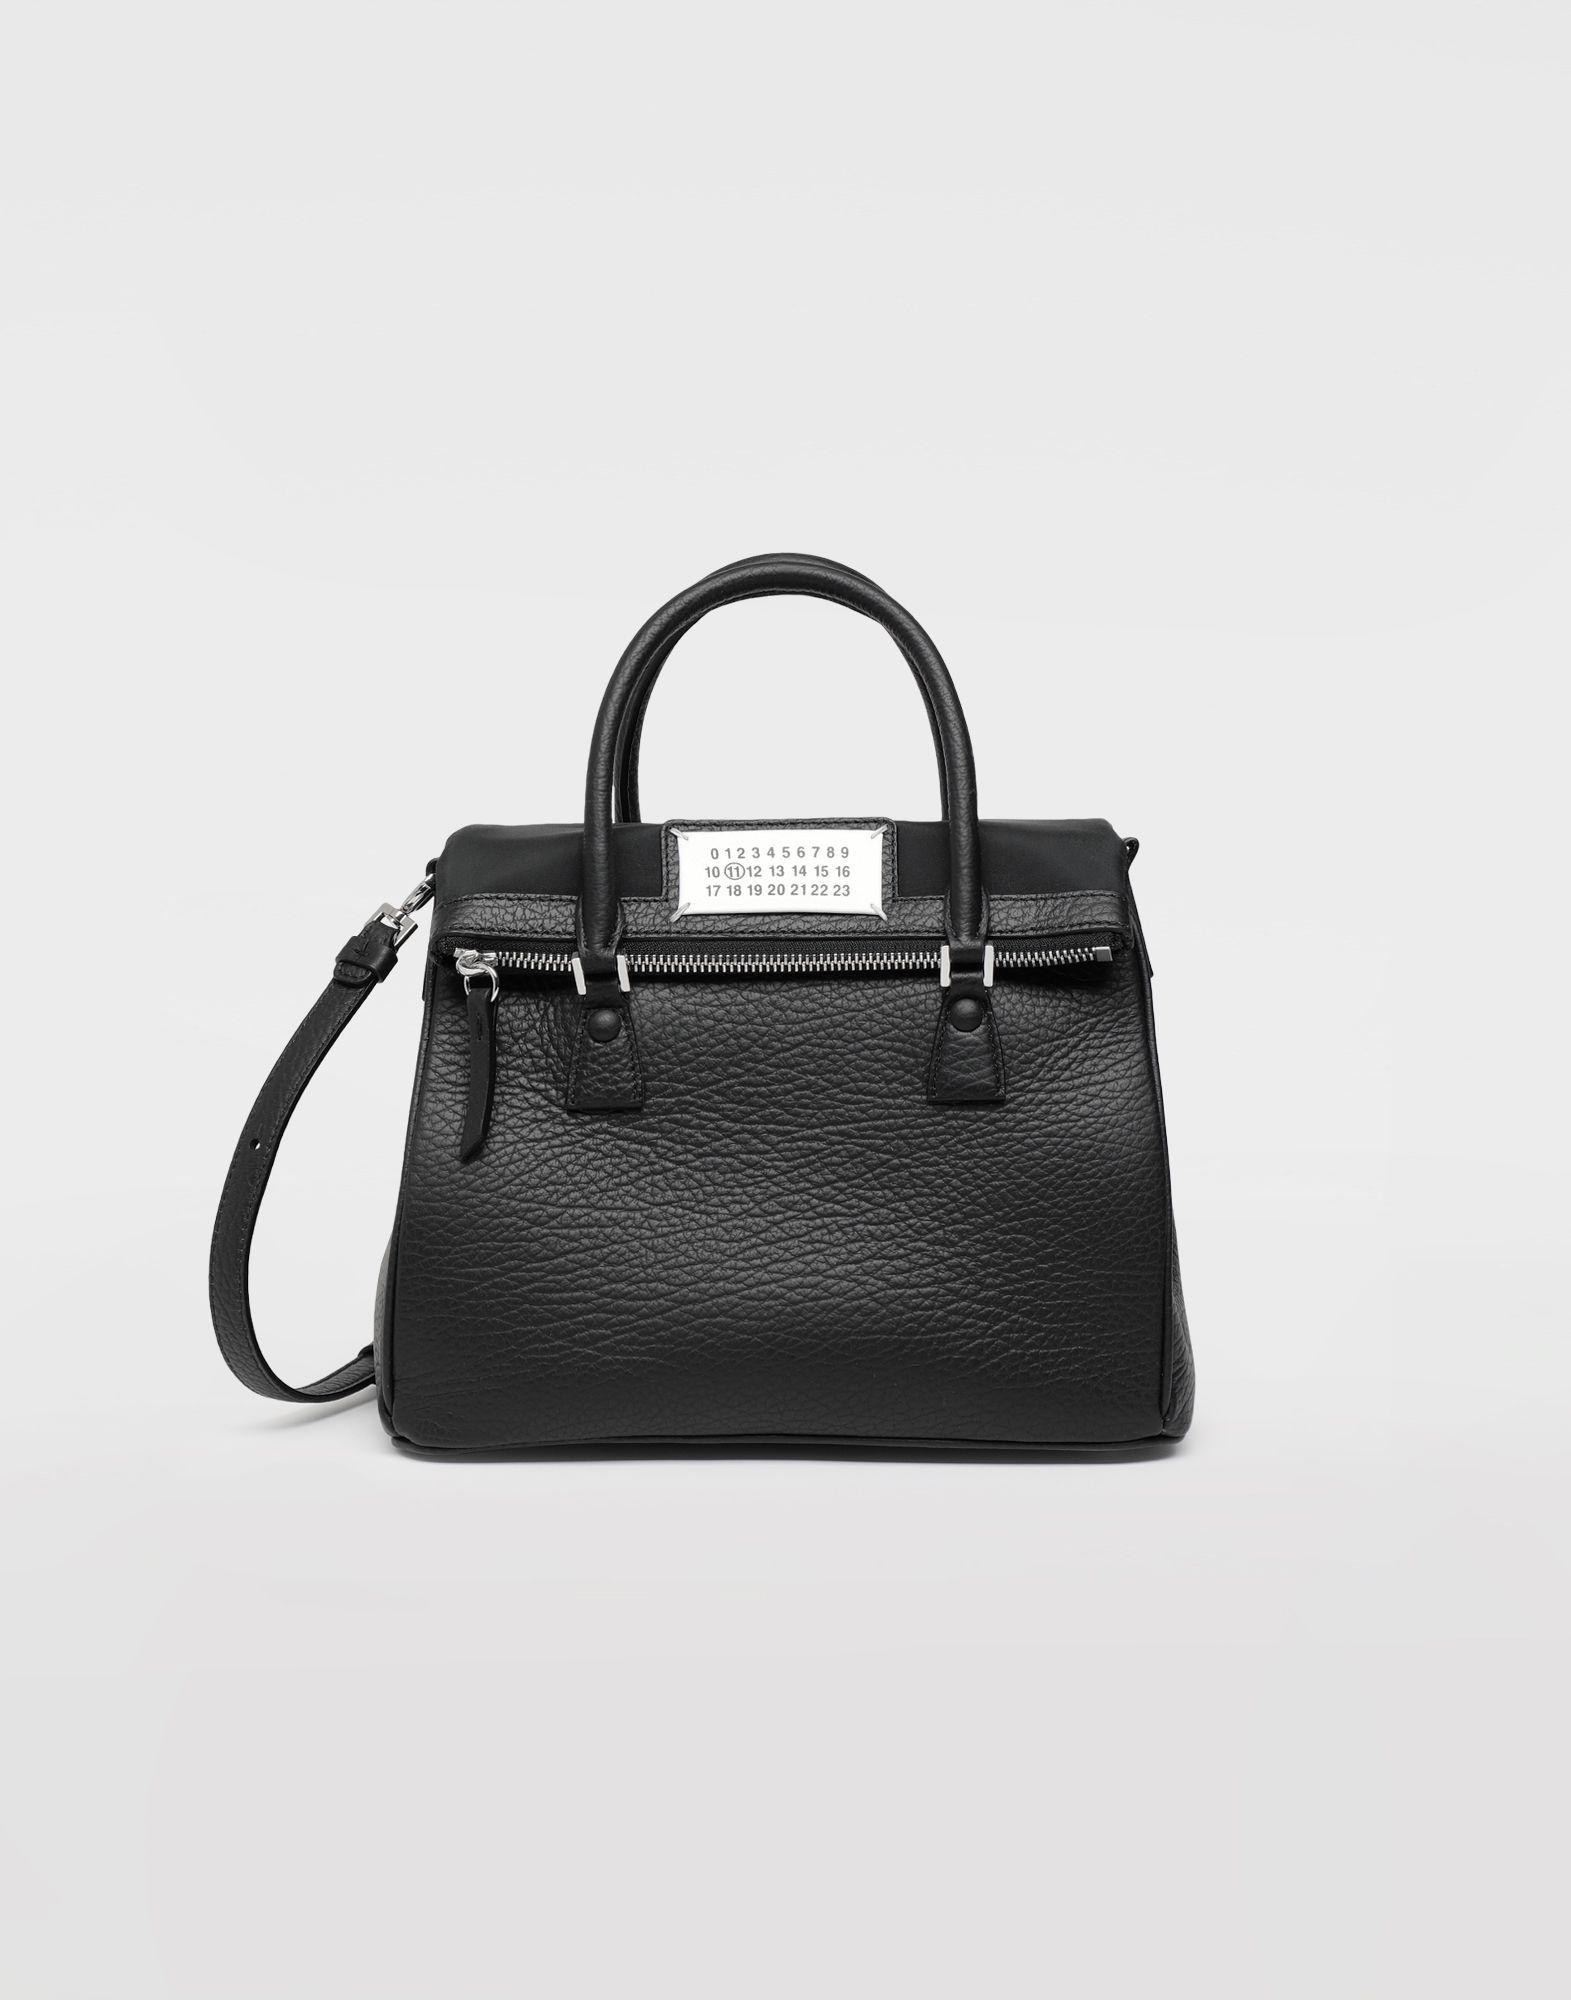 MAISON MARGIELA 5AC 3-pockets bag Handbag Woman f